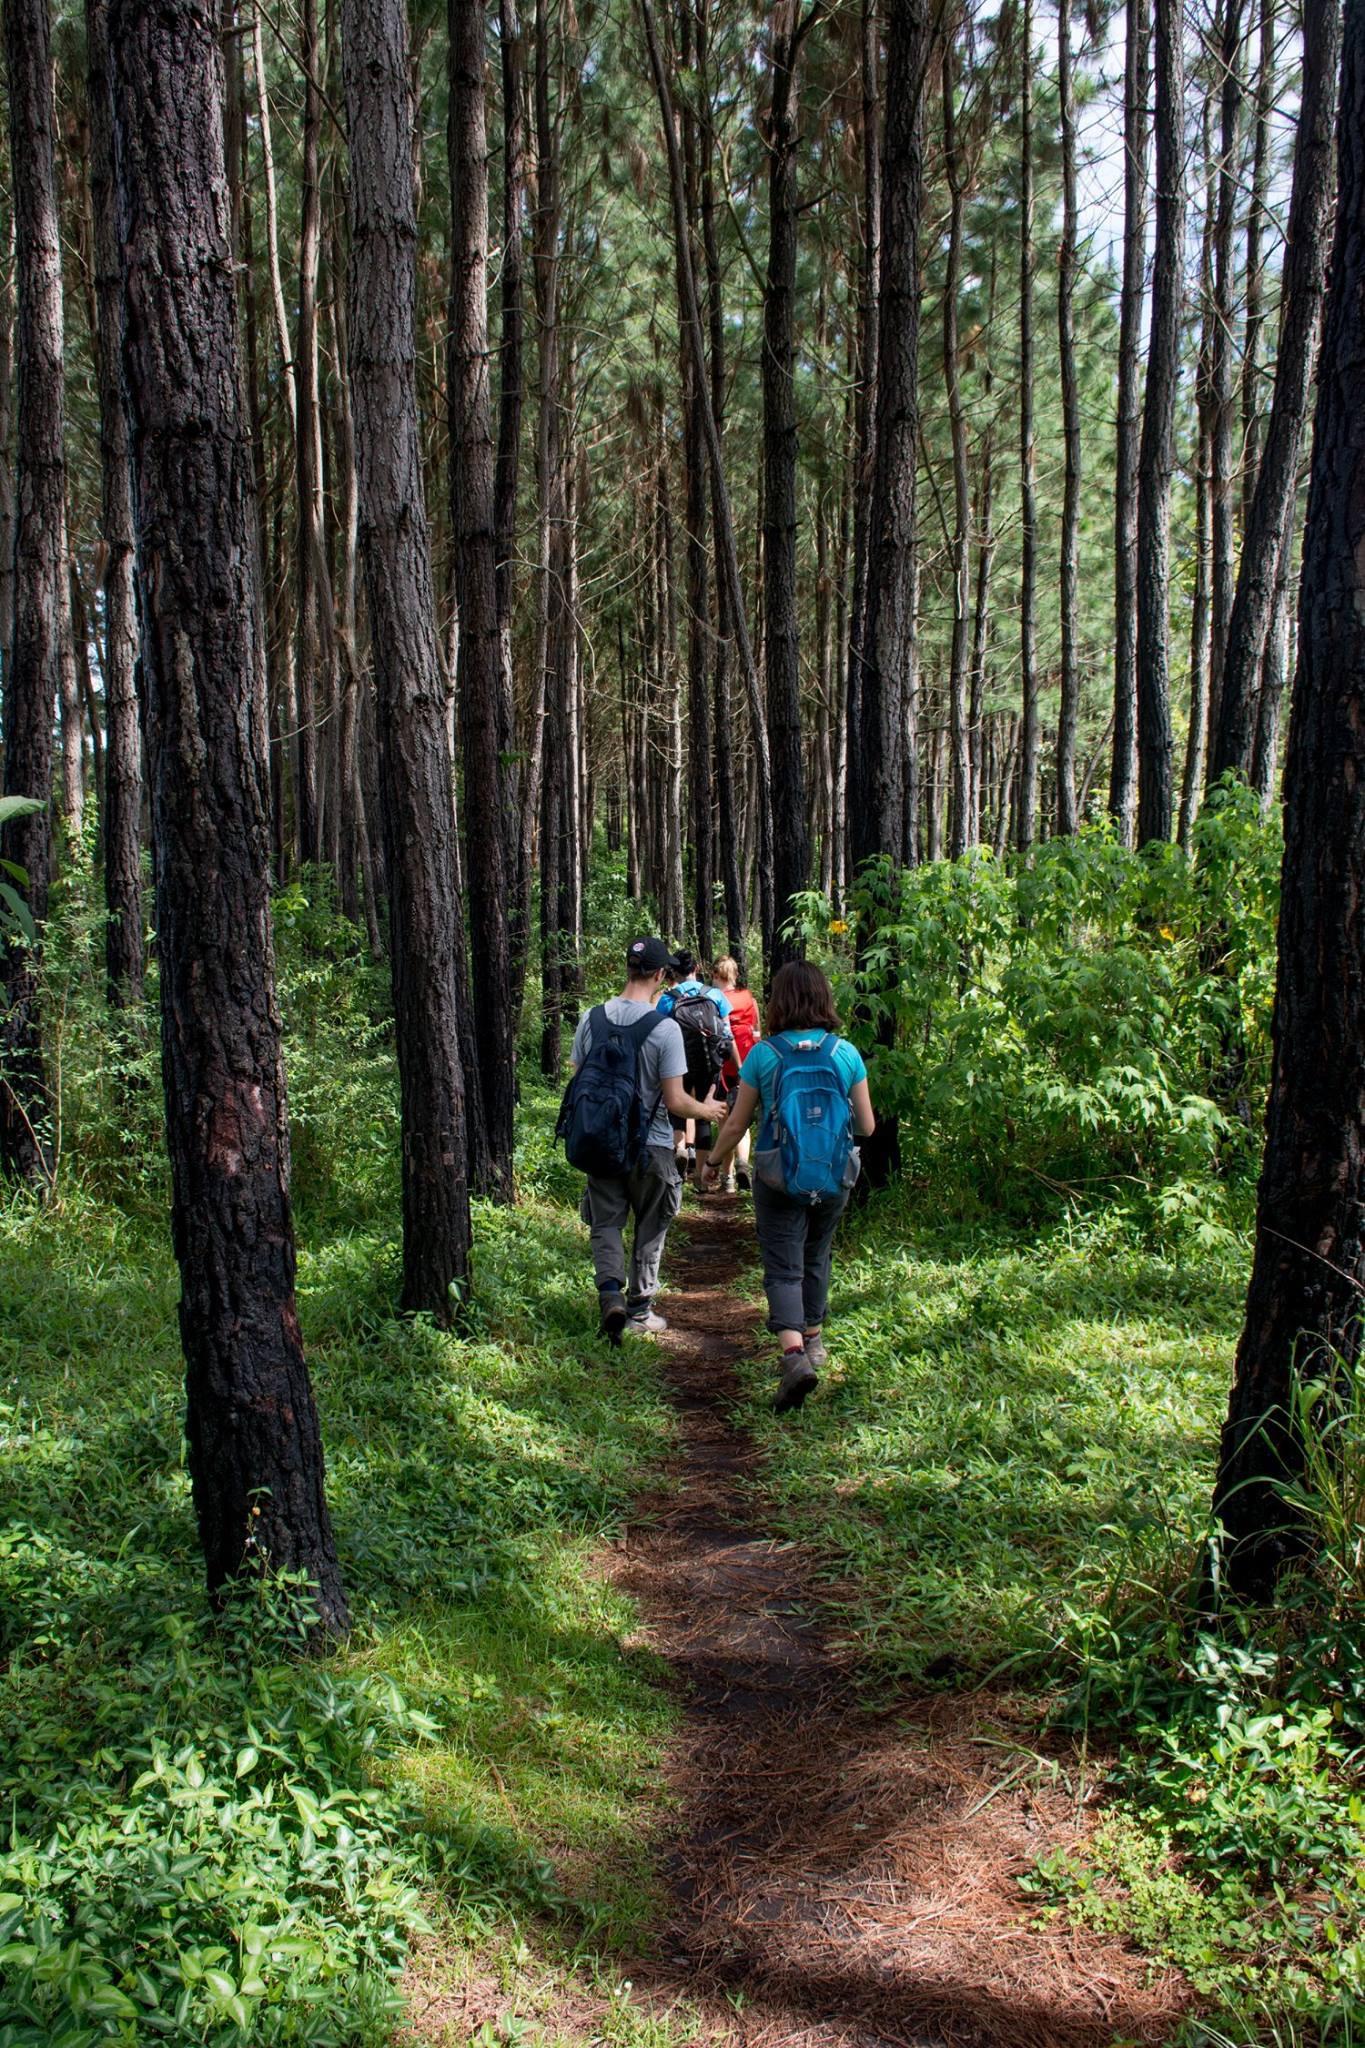 Trek the guided forest walk